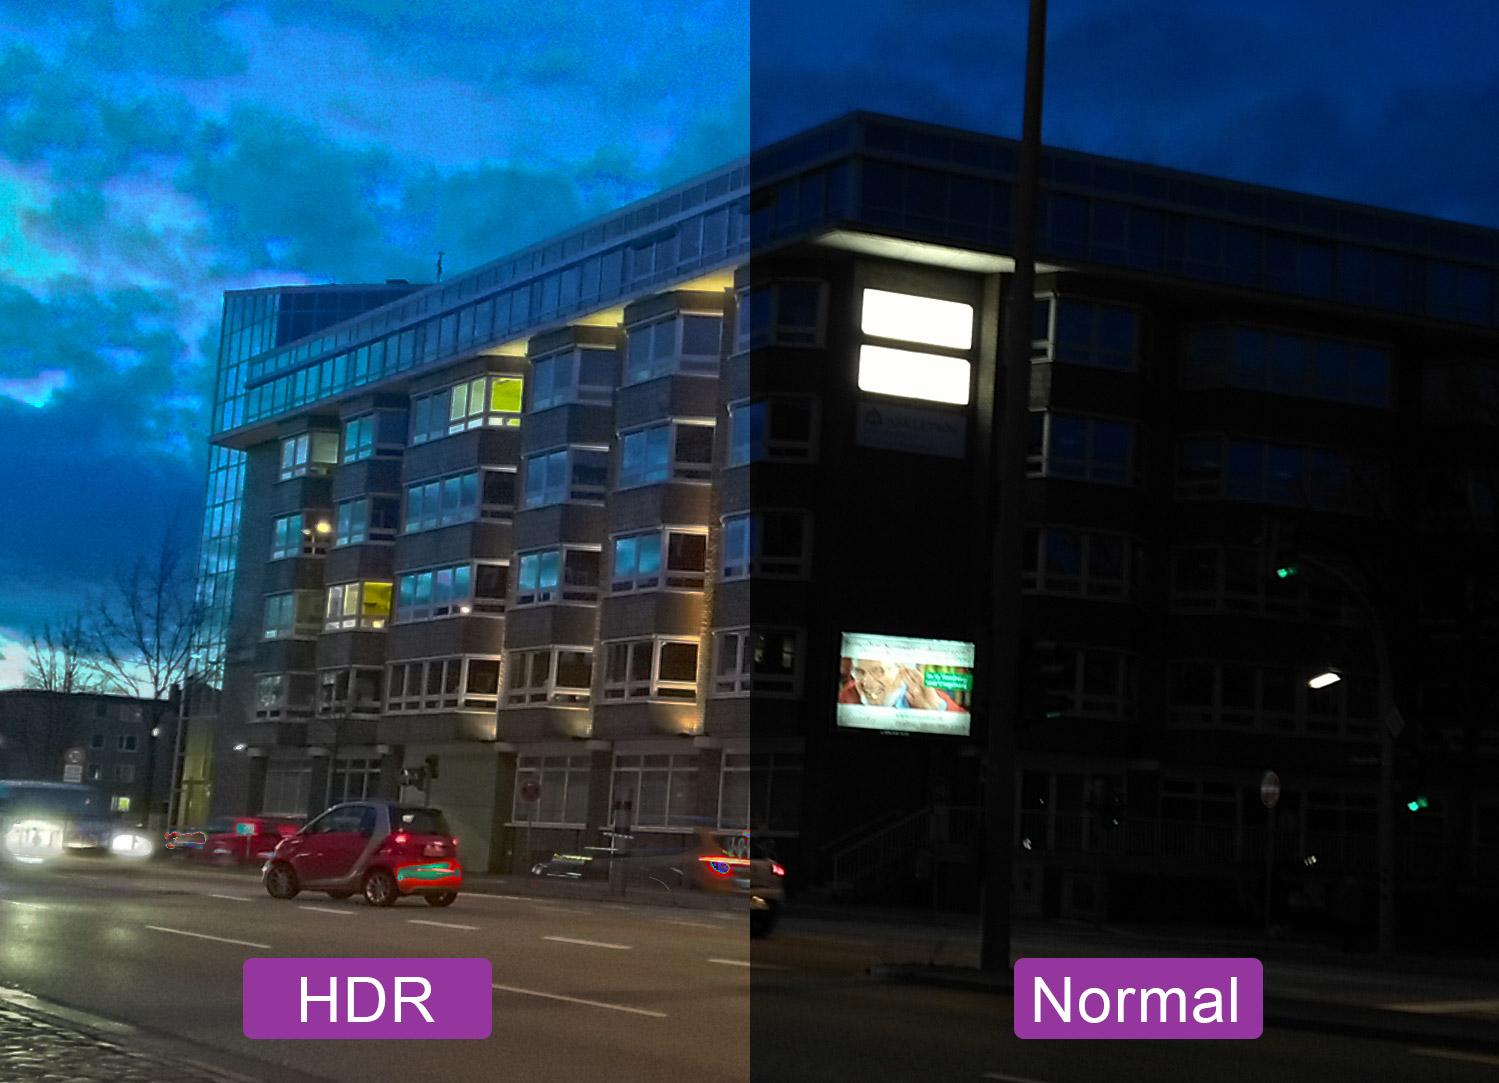 HDR-Modus auf Smartphone